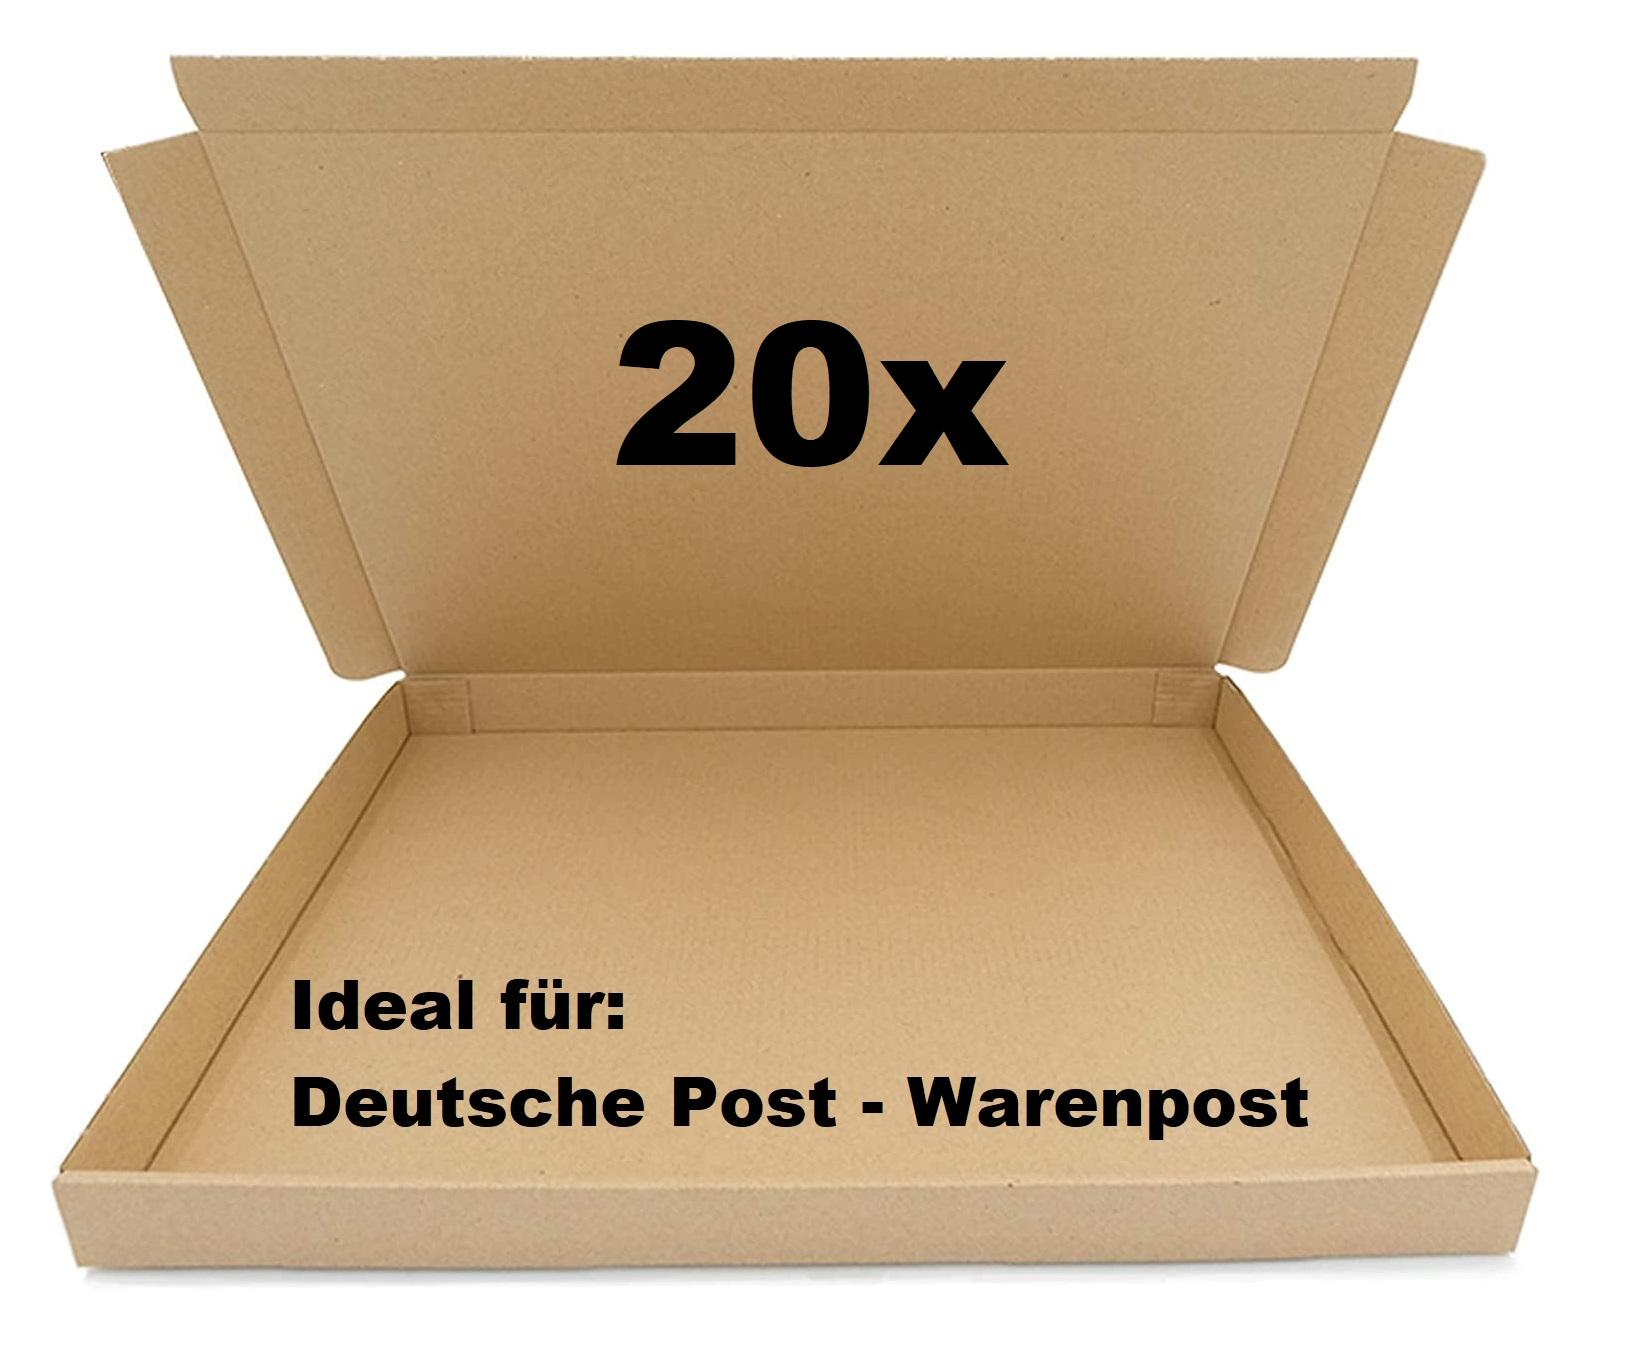 20x SAD Warenpostkartons 350x250x30mm Karton für Warenpost International XS geeignet - DIN A4 Format